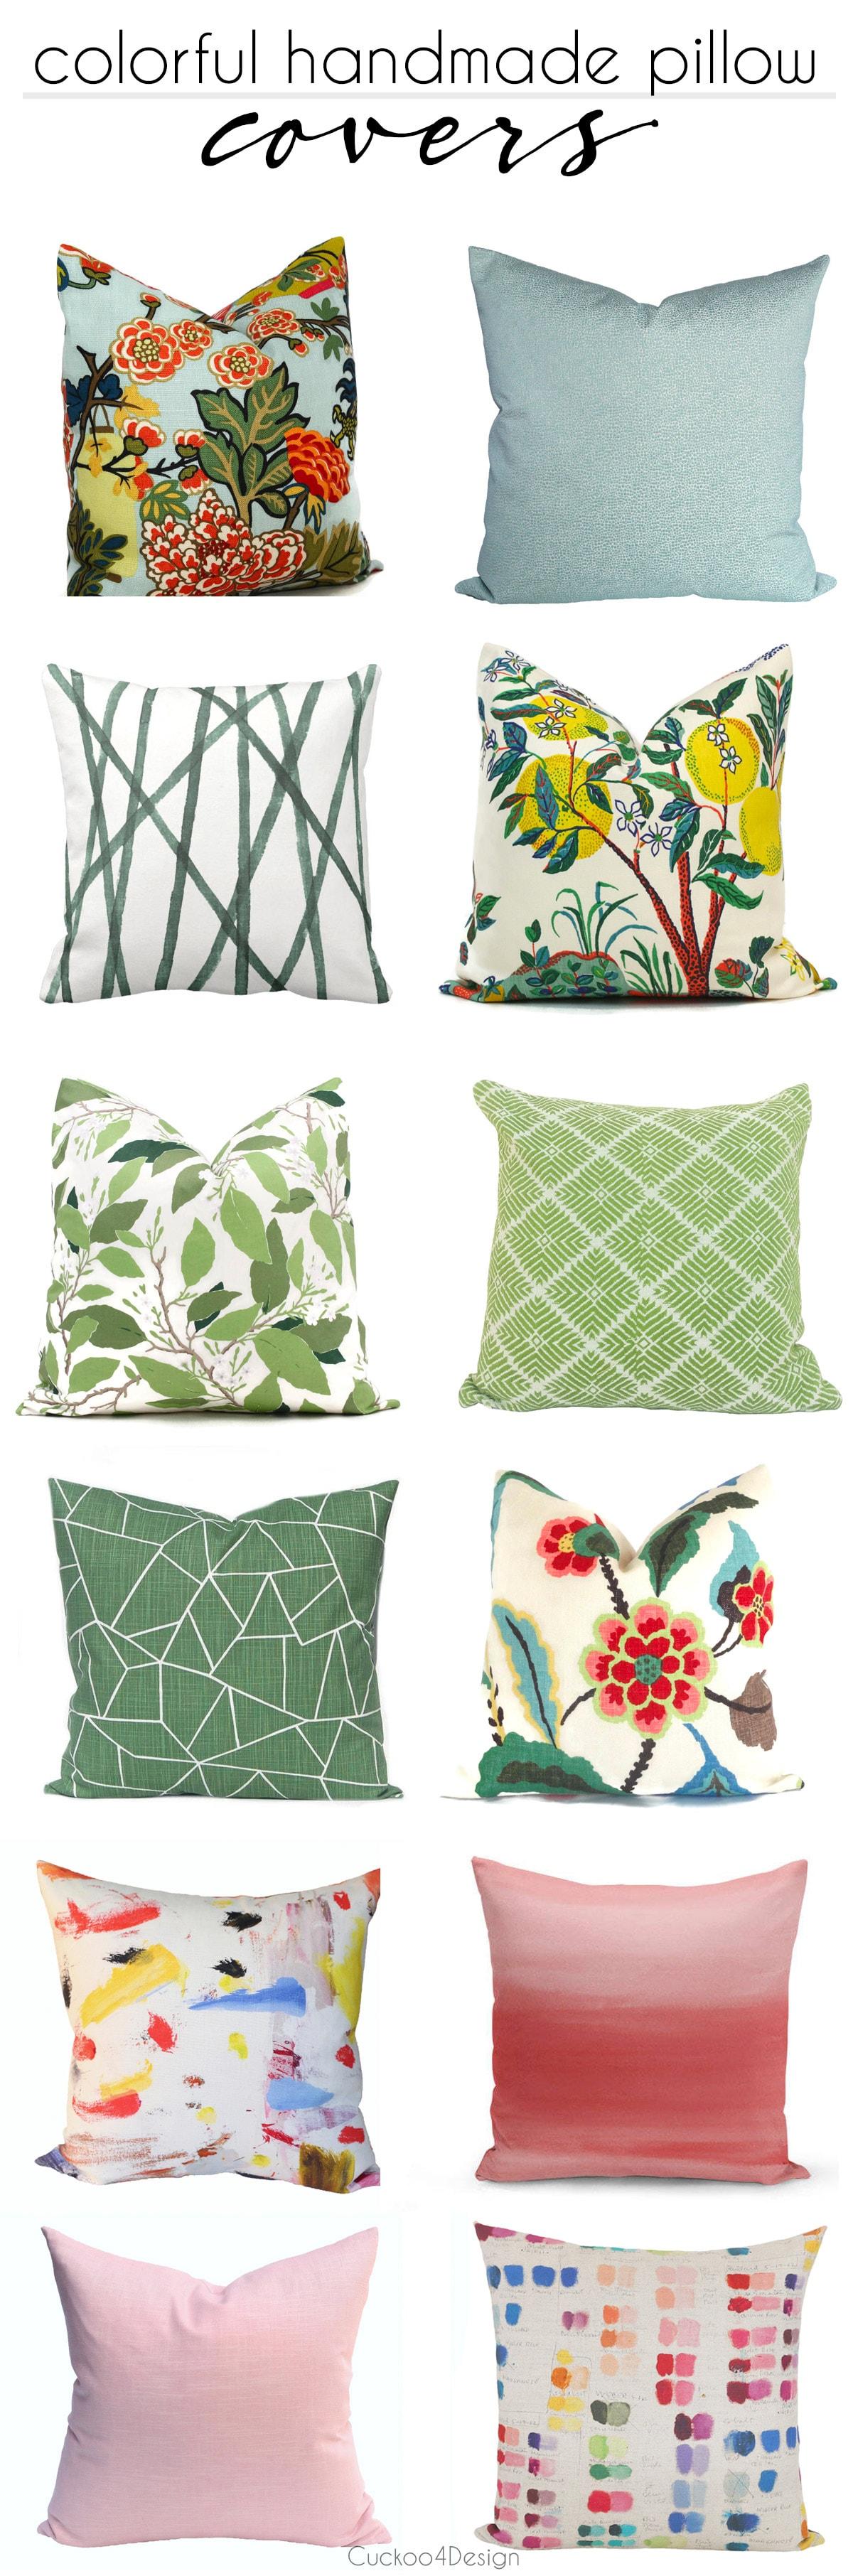 colorful throw pillows | beautiful throw pillows  | designer throw pillows | handmade colorful throw pillows | Schumacher throw pillows | Etsy throw pillows | patterned colorful throw pillows #throwpillows #homedecor